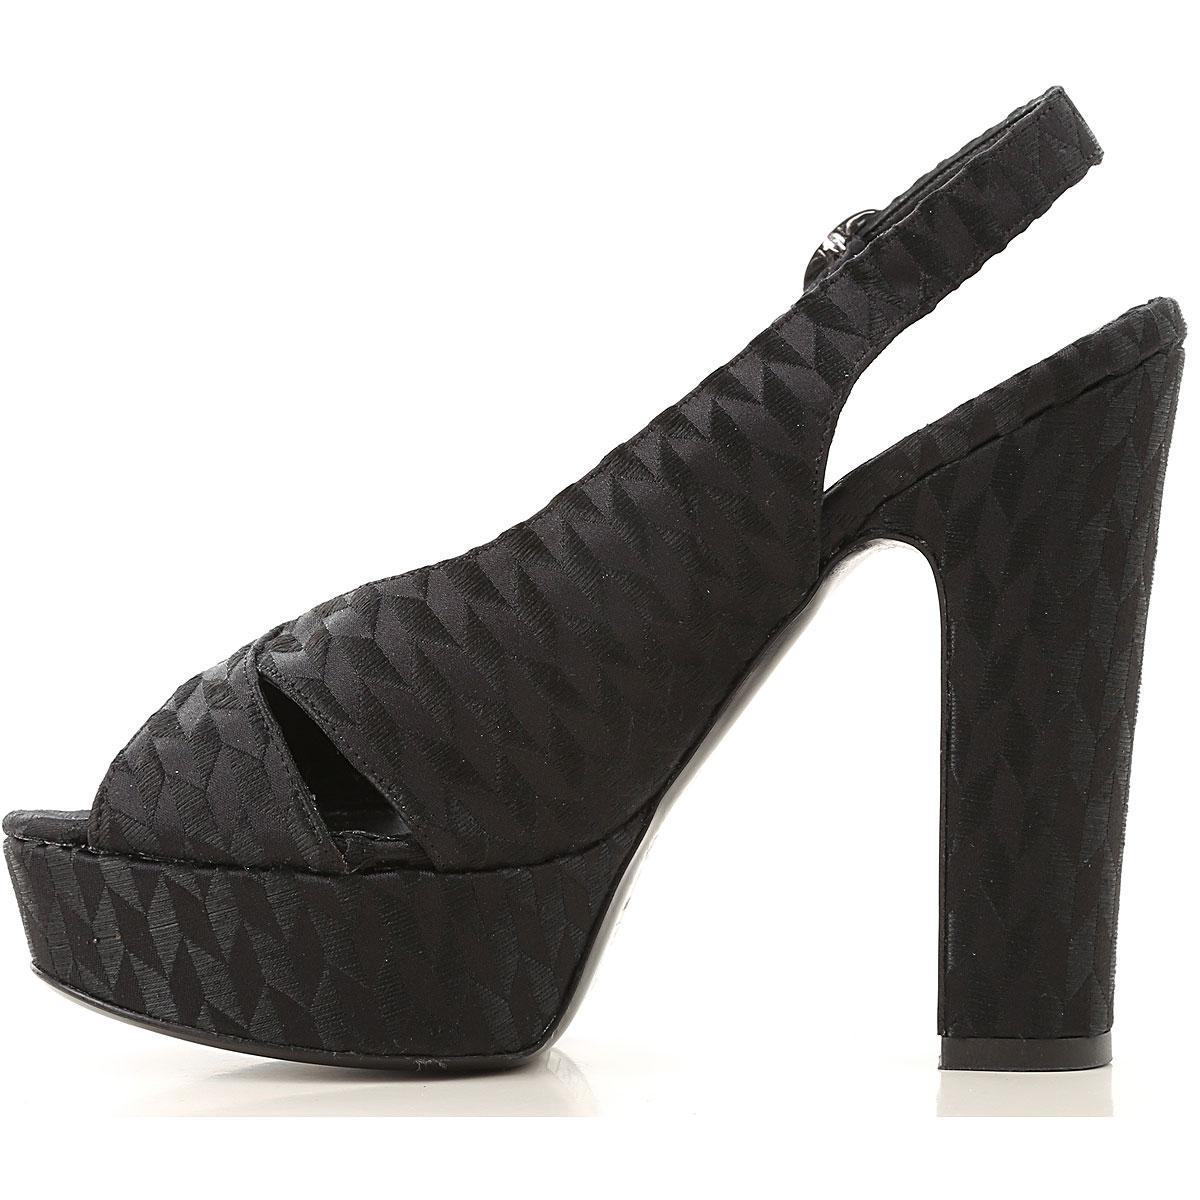 28c234cad2d Strategia - Black Sandals For Women - Lyst. View fullscreen